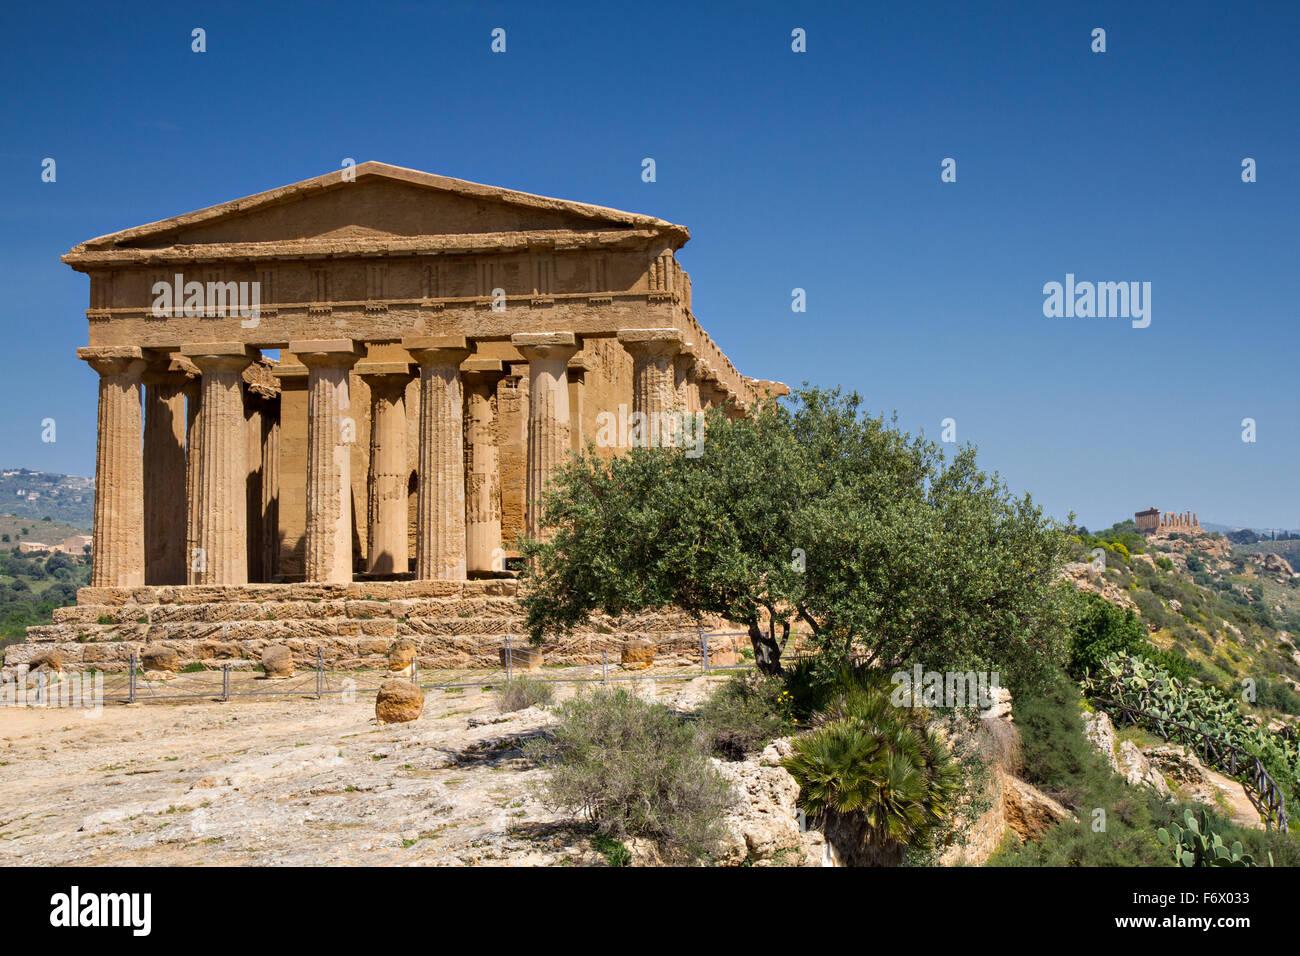 Valley of the Temples, Agrigento, Sizilien, Italien Stockbild